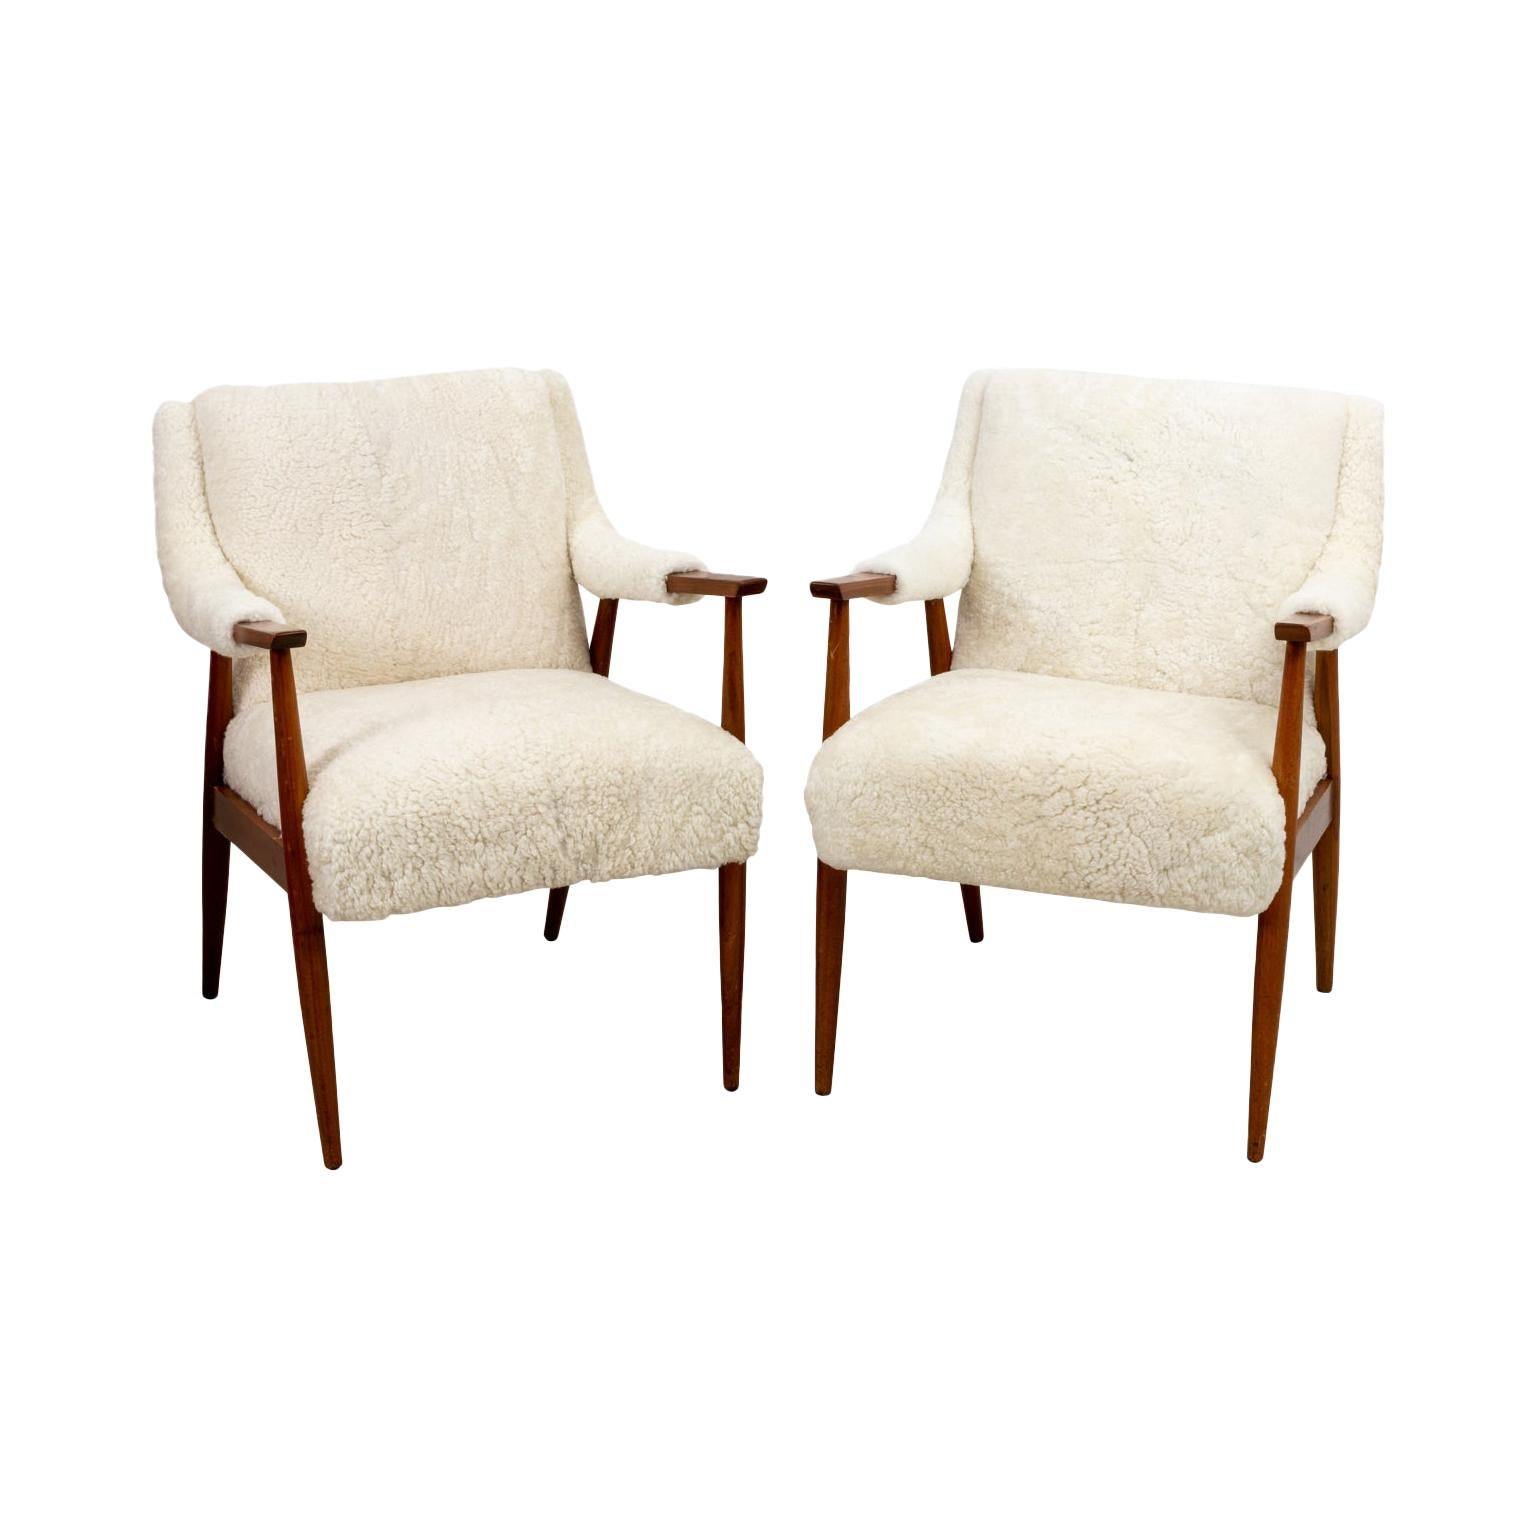 Shearling Danish Modern Chairs